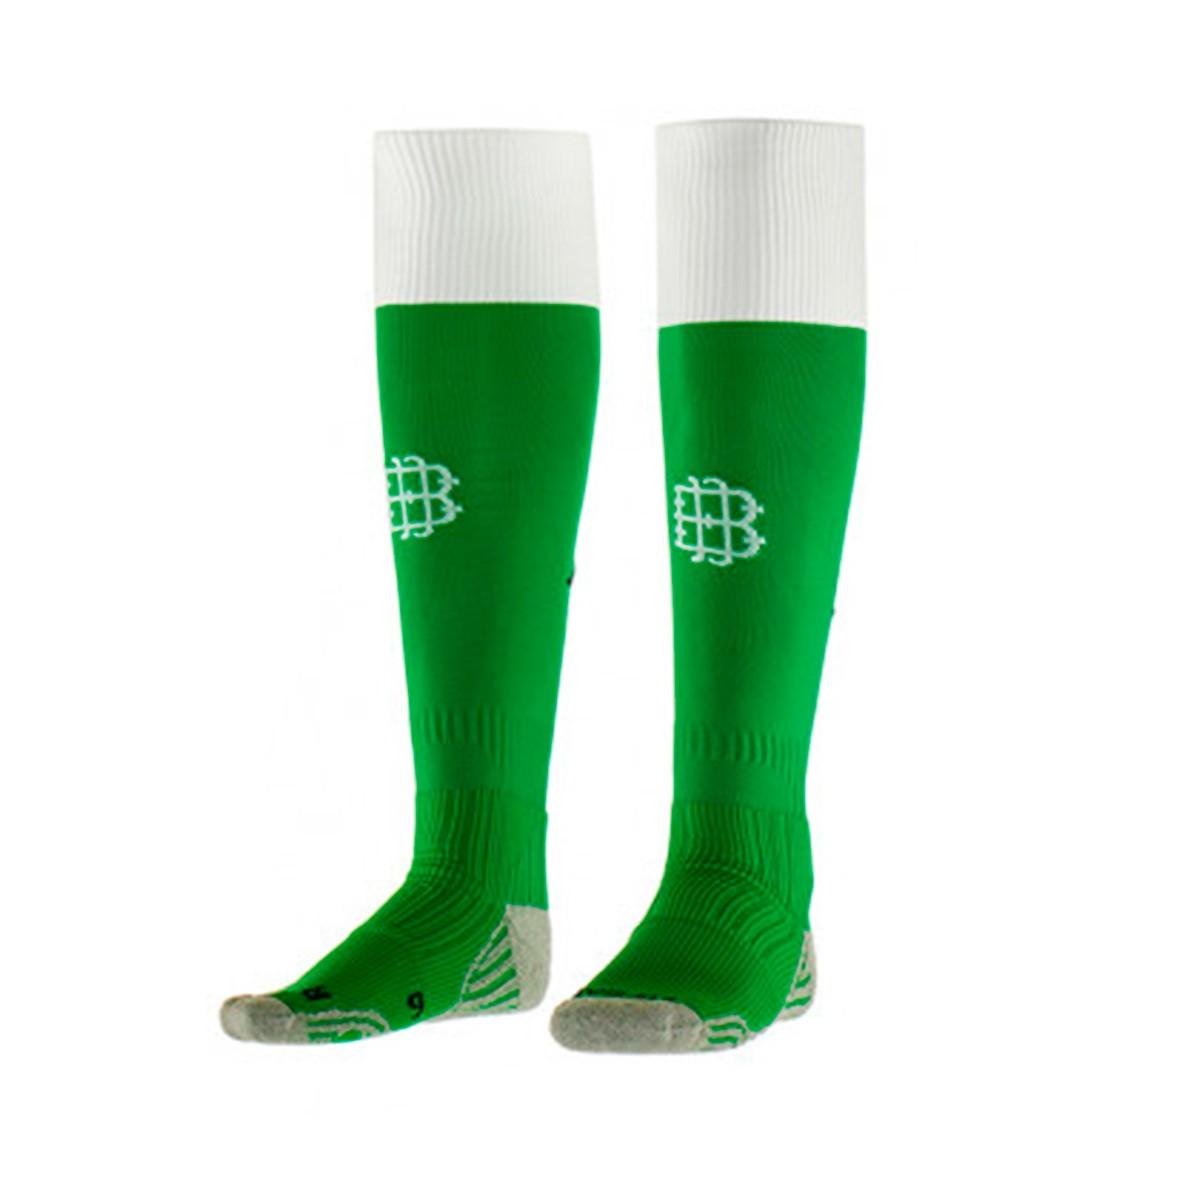 78b569a91c9a2 Football Socks Kappa Real Betis Balompié 2018-2019 Green-White ...